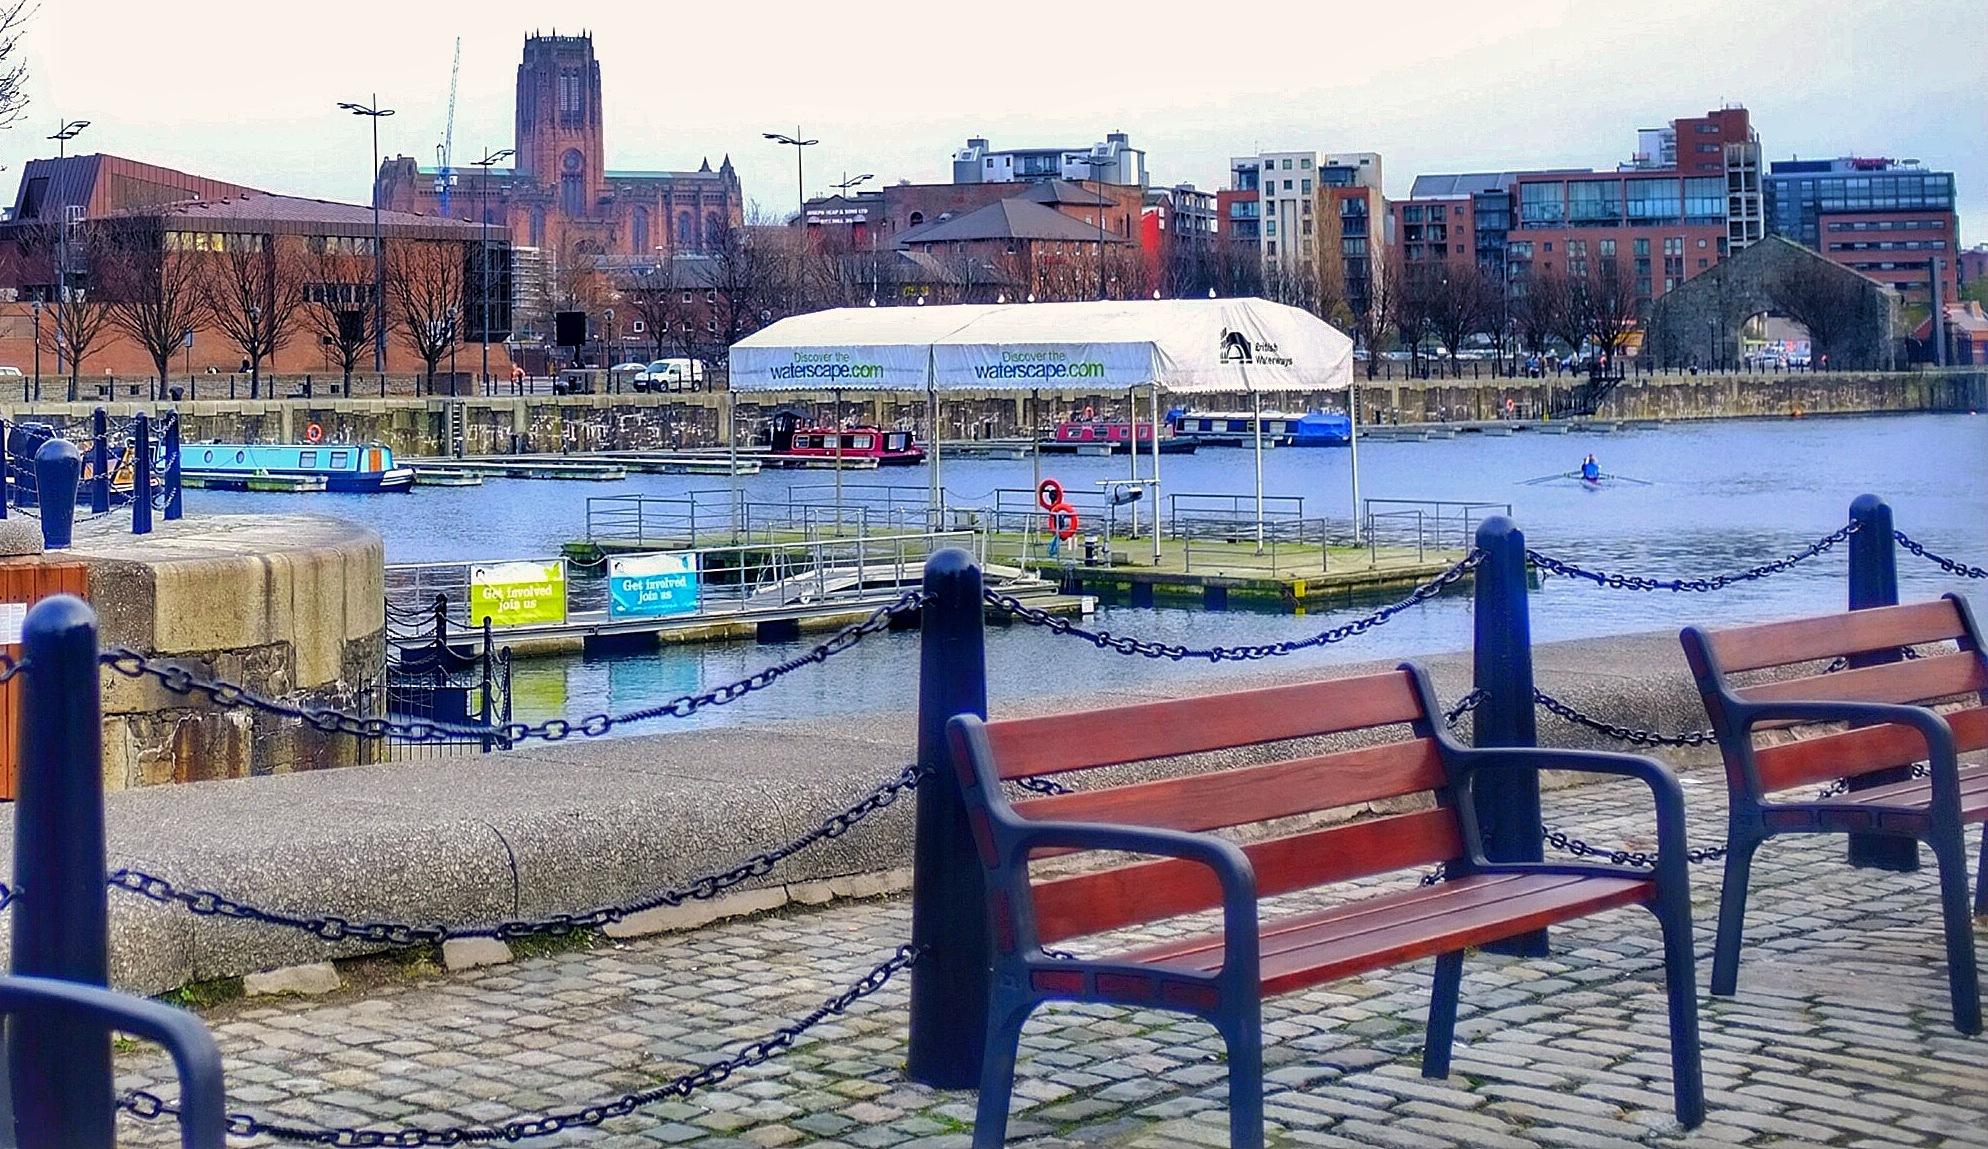 Liverpool Old Docks...23062211 by Michael jjg